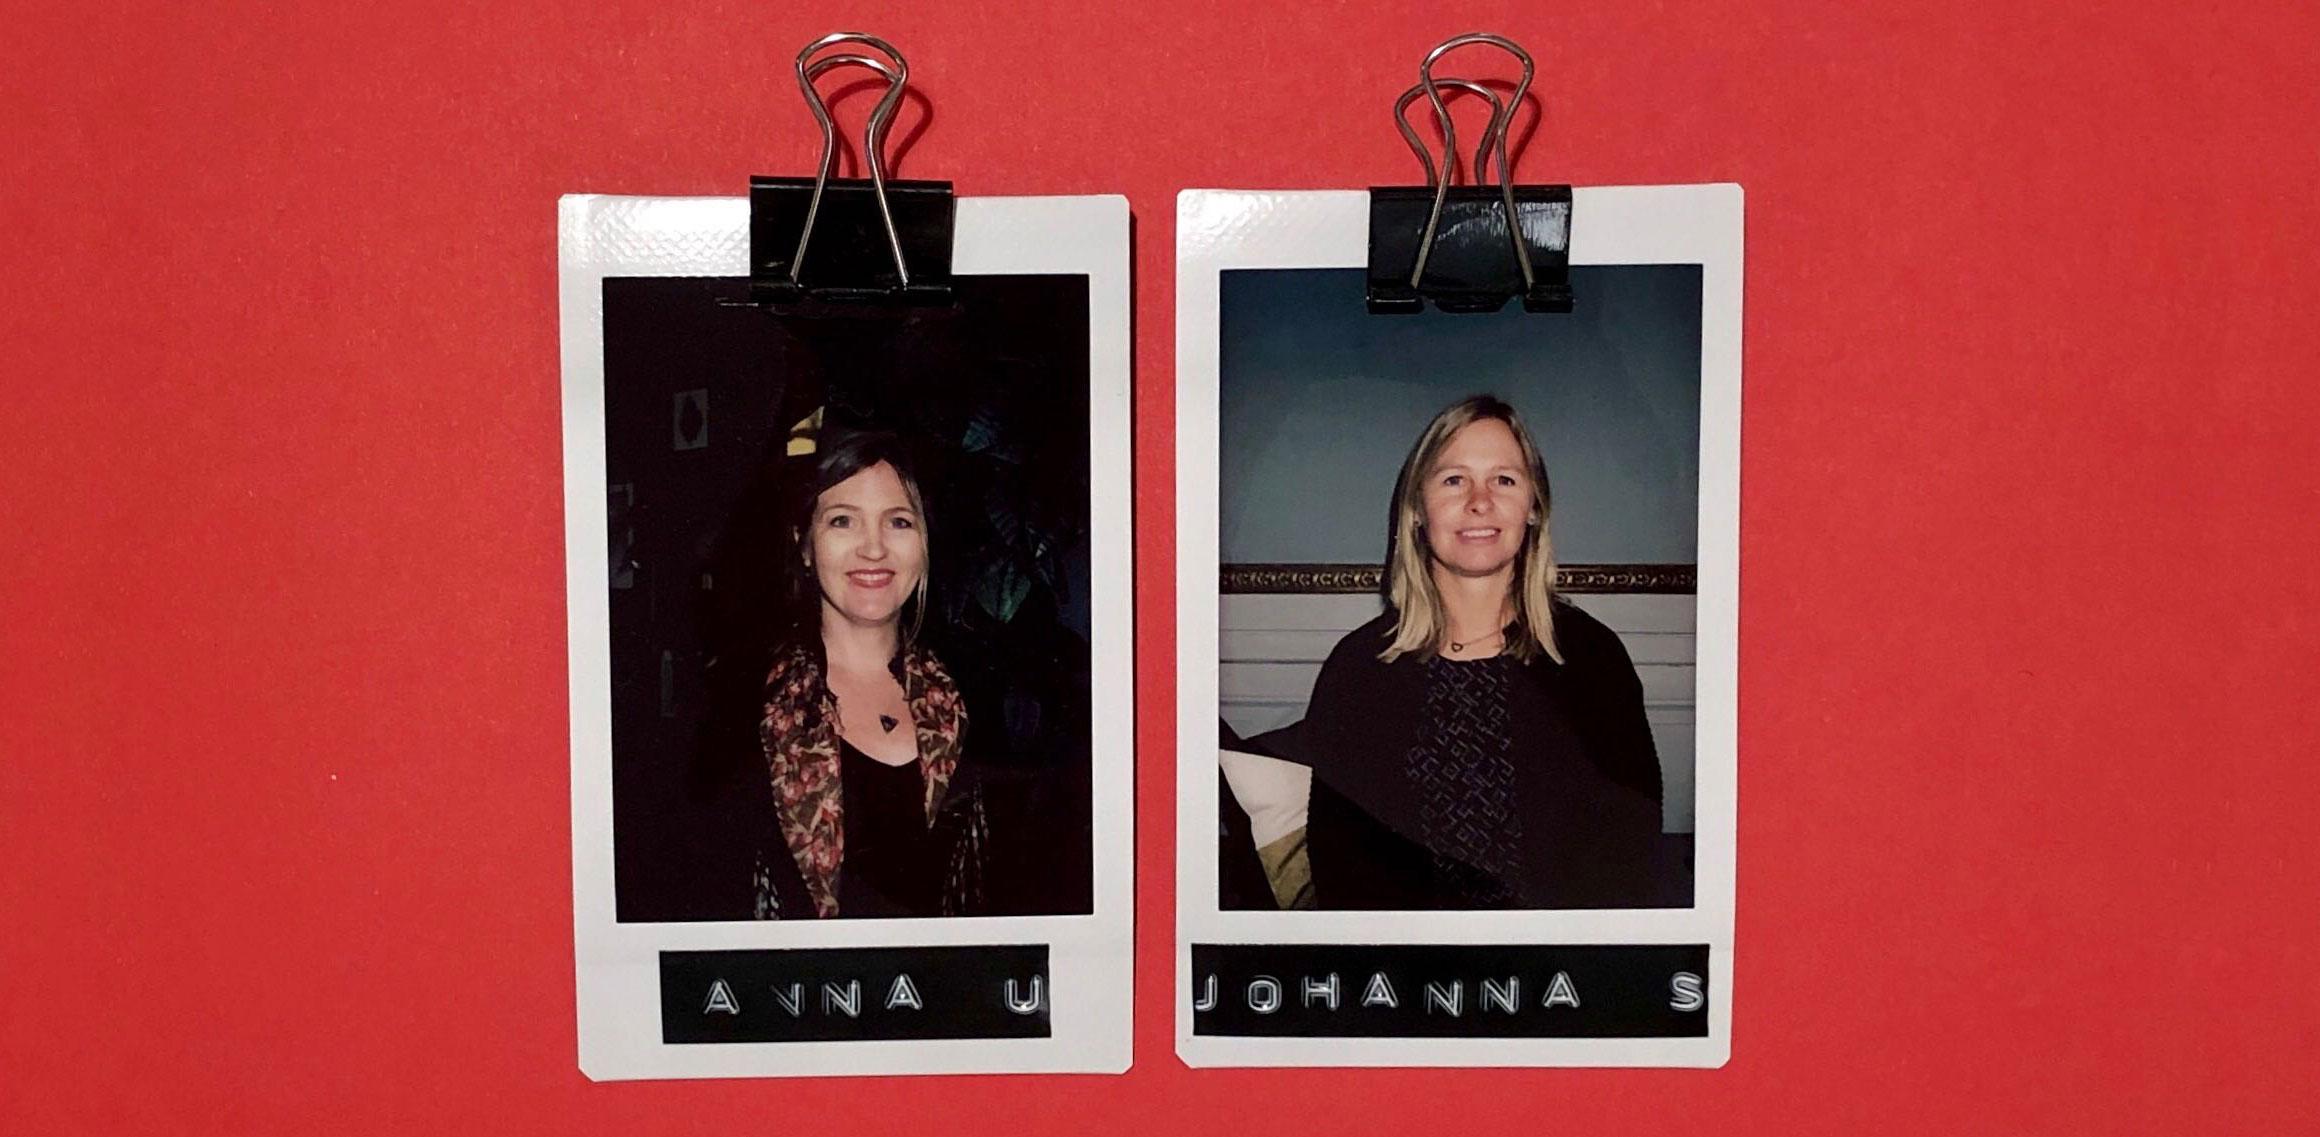 Welcome Johanna Särnå and Anna Uleander!